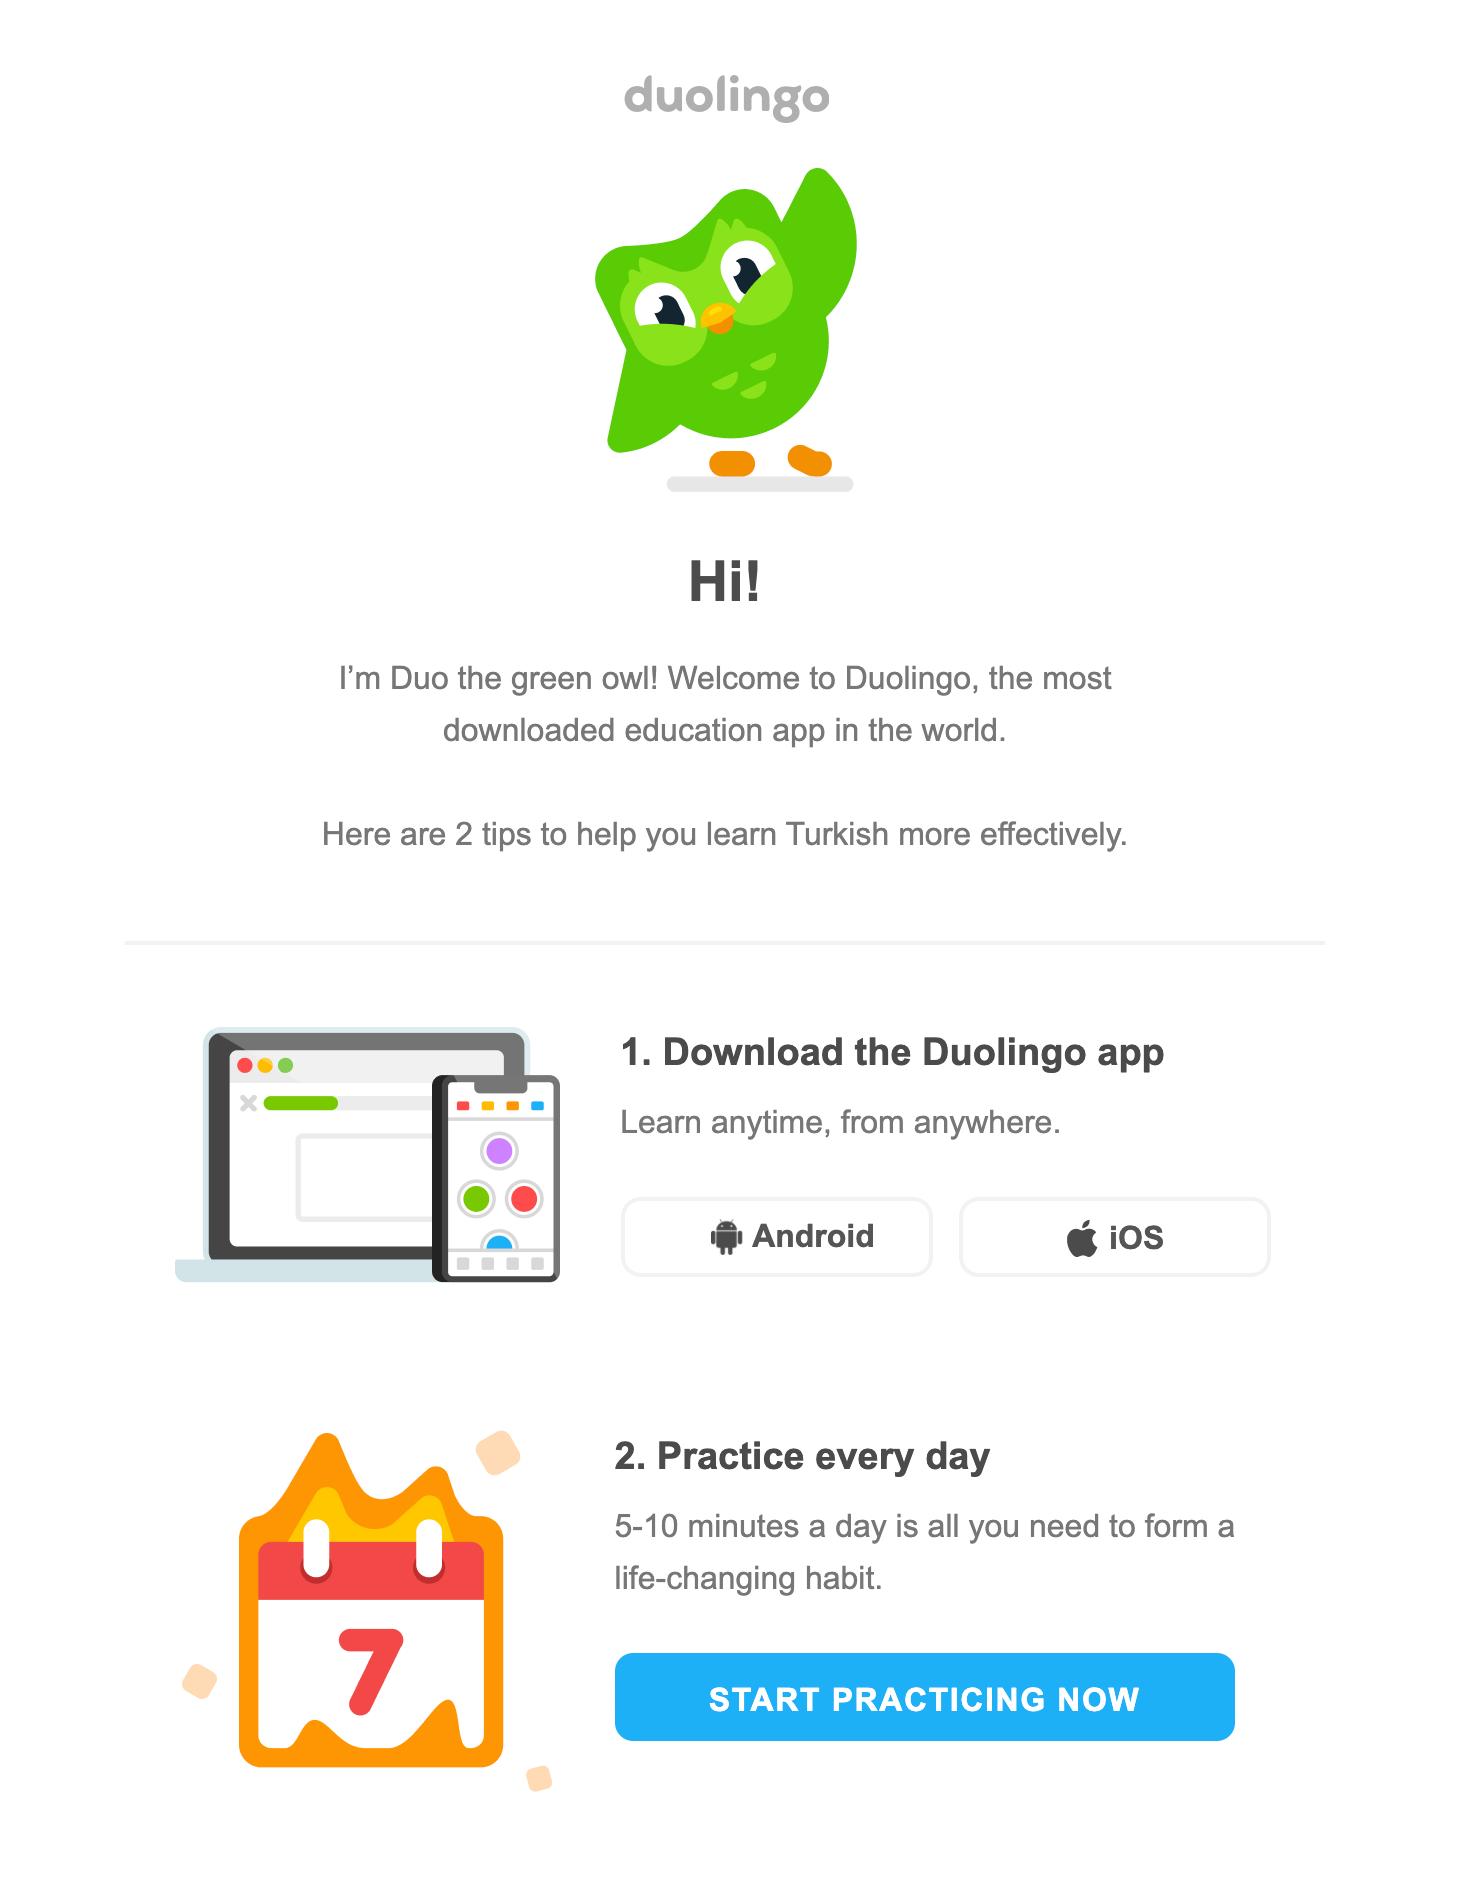 duolingo welcome email